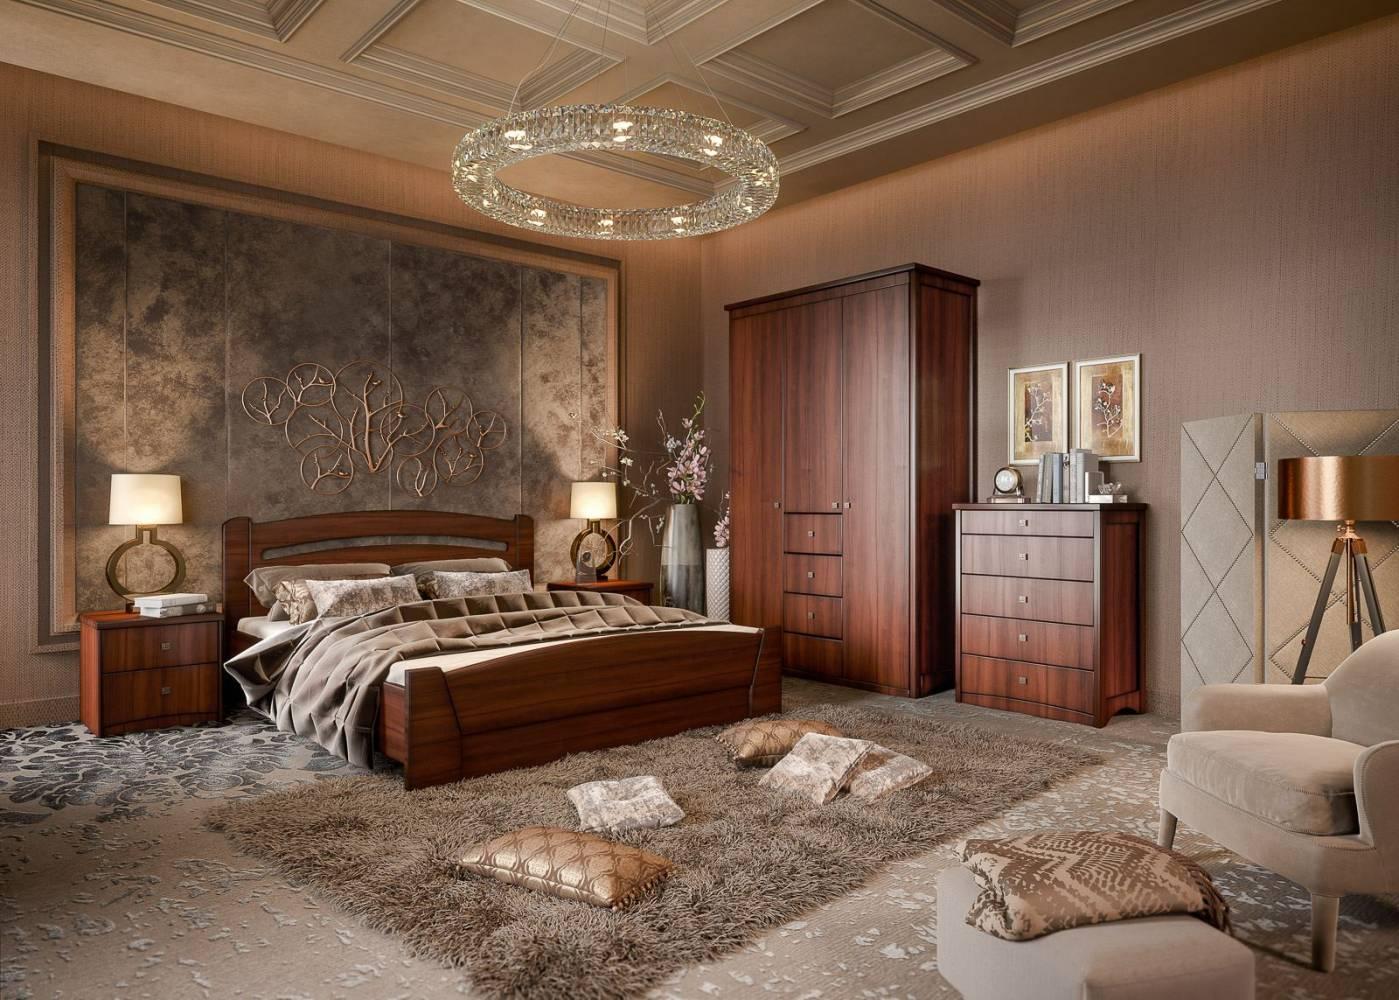 Спальня Вагнер Орех. Комплект